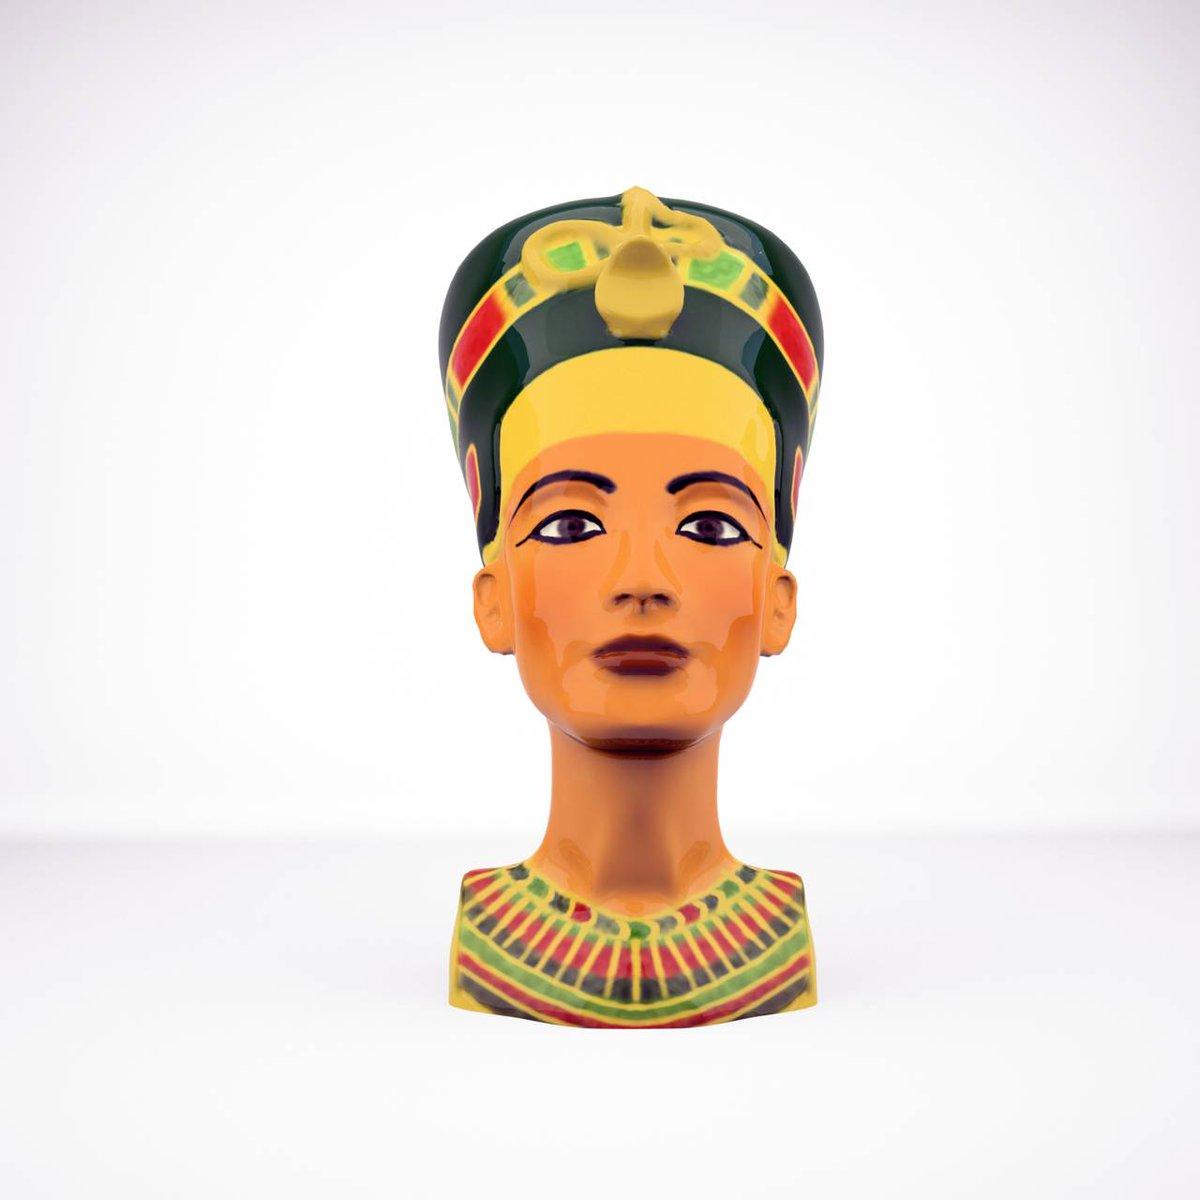 Diamond of Africa music instrumental . Get it here http://bit.ly/DiamondofAfrica  #AfricaDay #DiamondOfAfrica #AfricaRiseUp #Beats